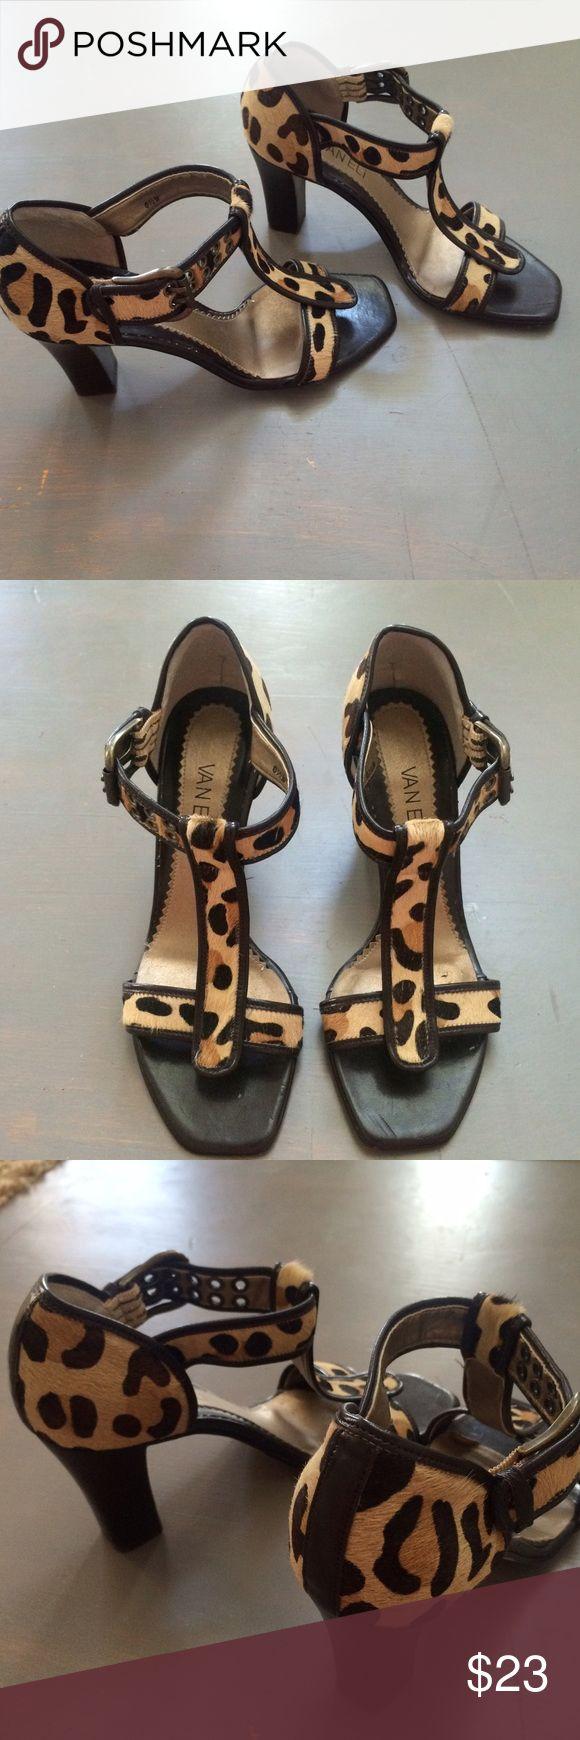 "Vaneli Animal Print Heels Sandals 6.5 -gently worn gorgeous heels  -some obvious wear on inside see pic 4 -some wear on bottom  -3 & 1/2"" heel Vaneli Shoes Heels"